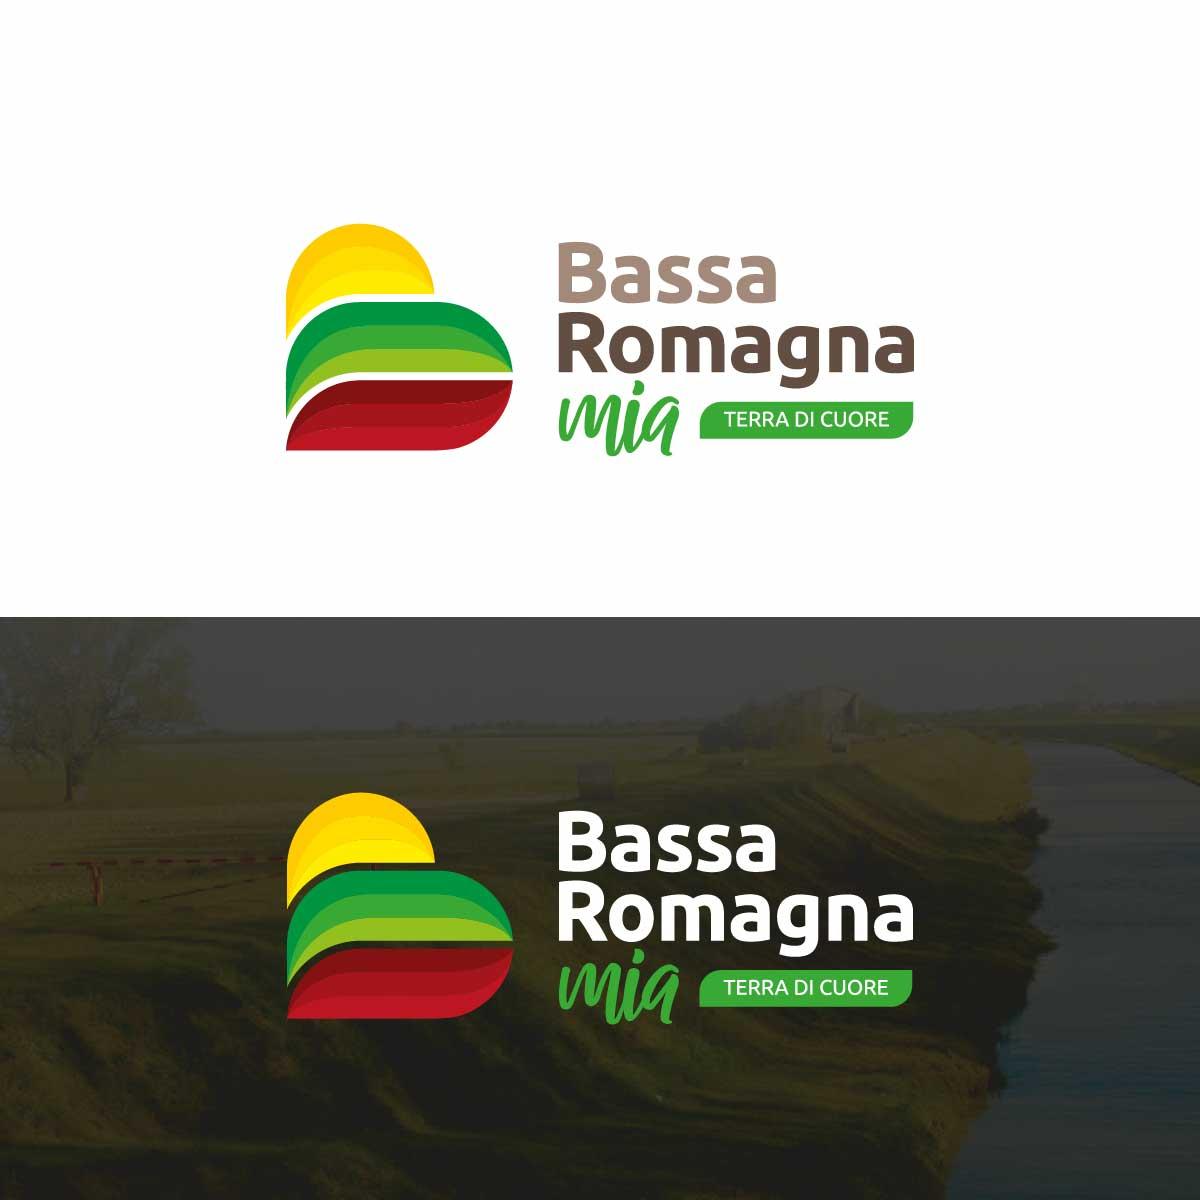 bassa romagna mia portale turismo branding logo 3